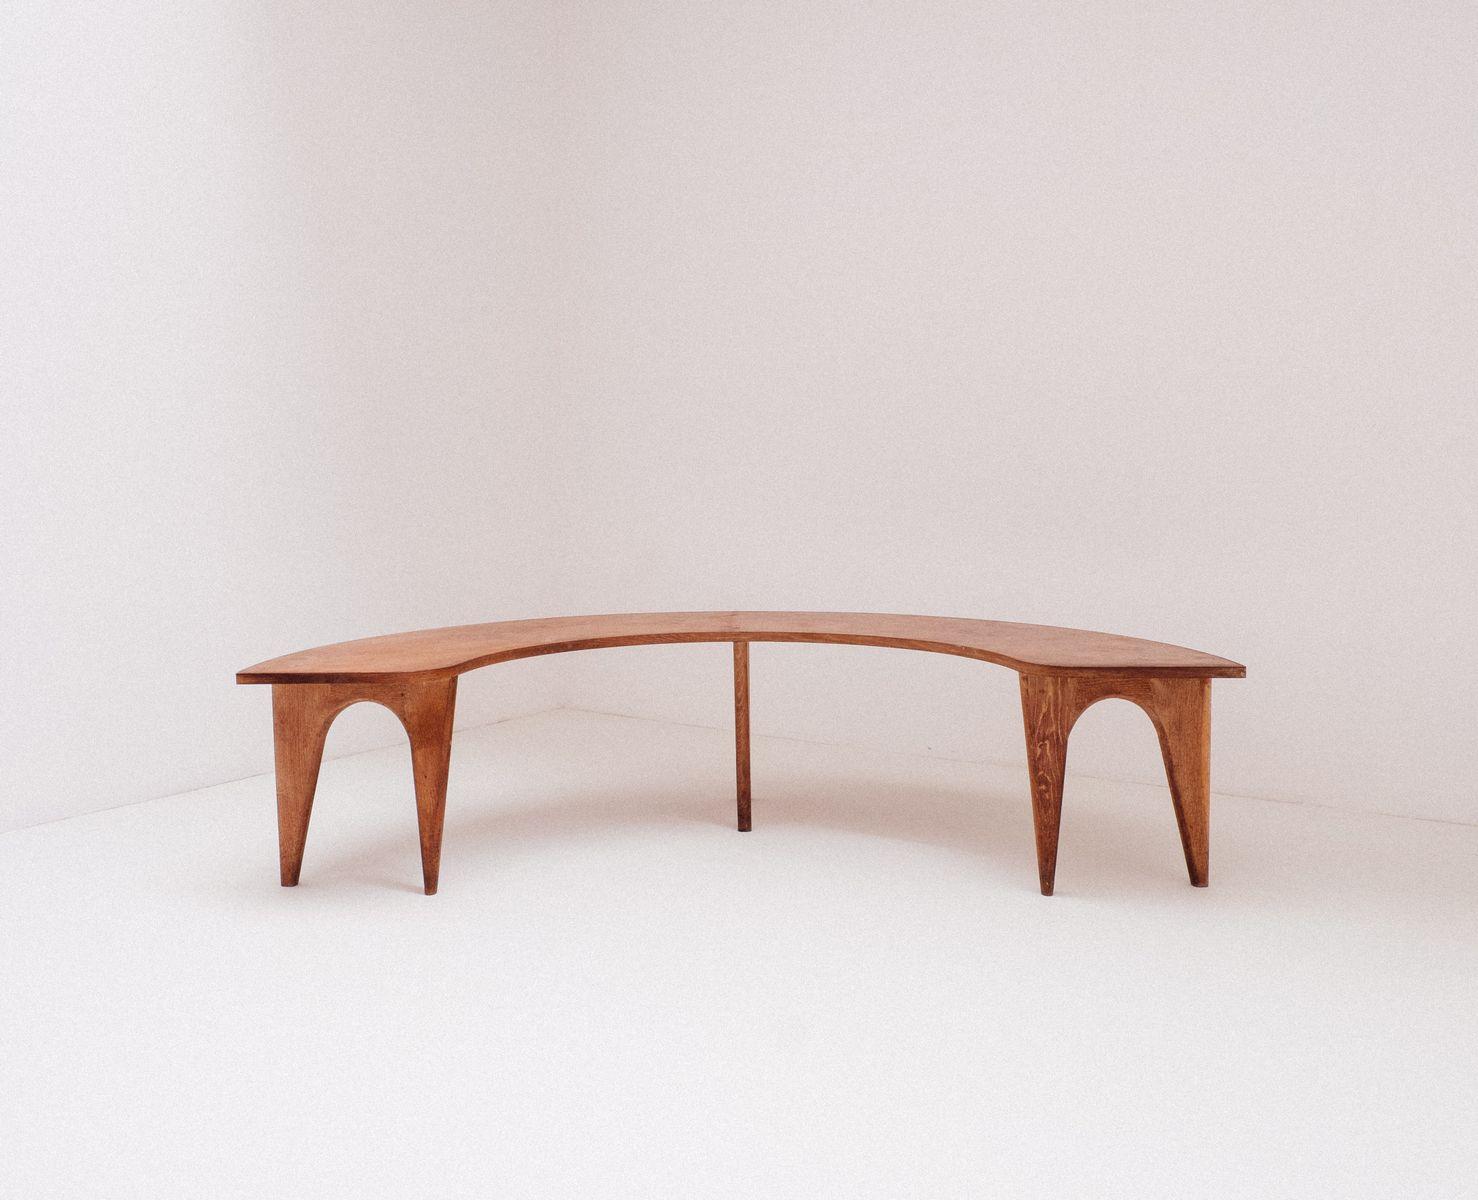 Oak dining room bench